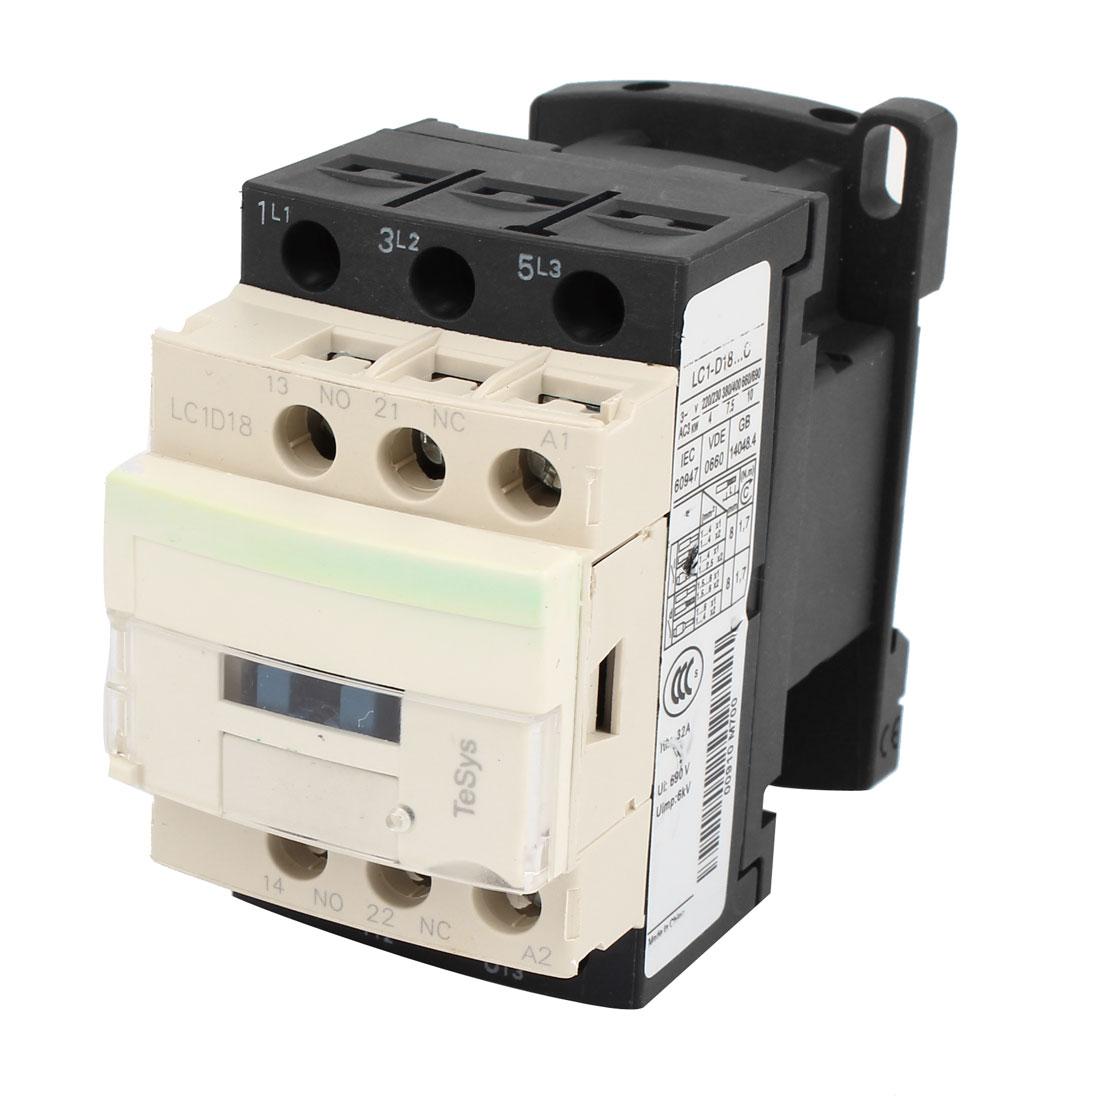 24V Coil Motor Controler AC Contactor 3 Pole 1NO 1NC 690V 32A